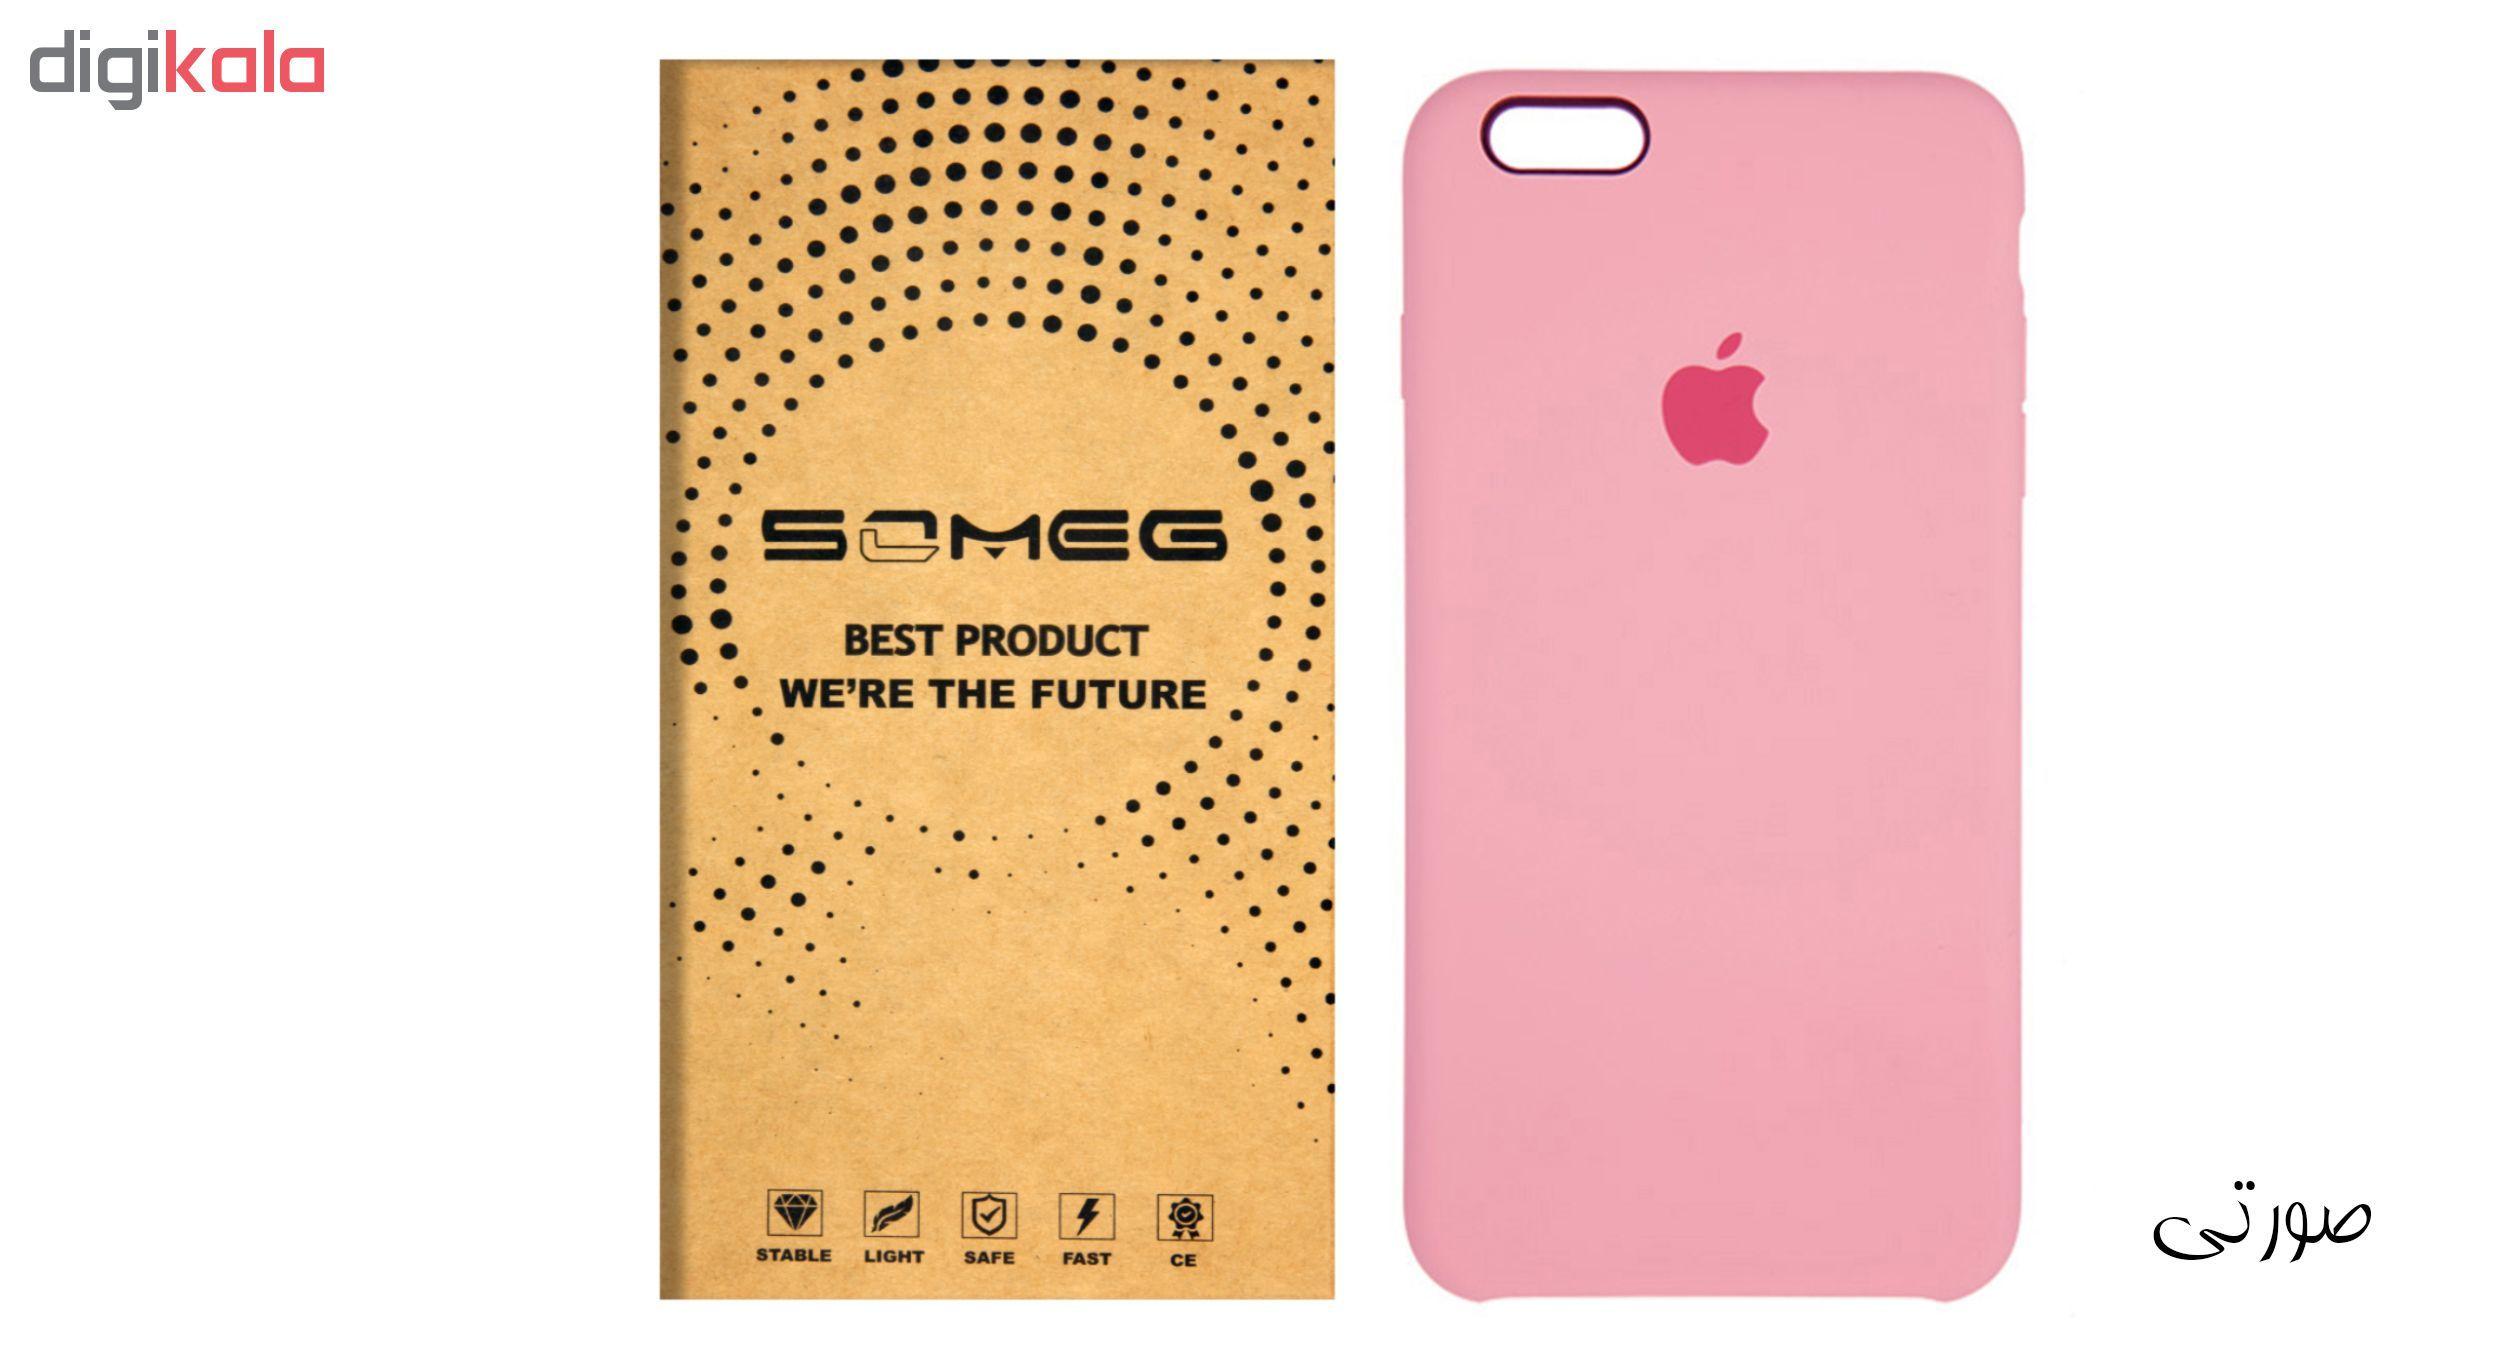 کاور سومگ مدل SIC مناسب برای گوشی موبایل اپل iPhone 6/6s main 1 19